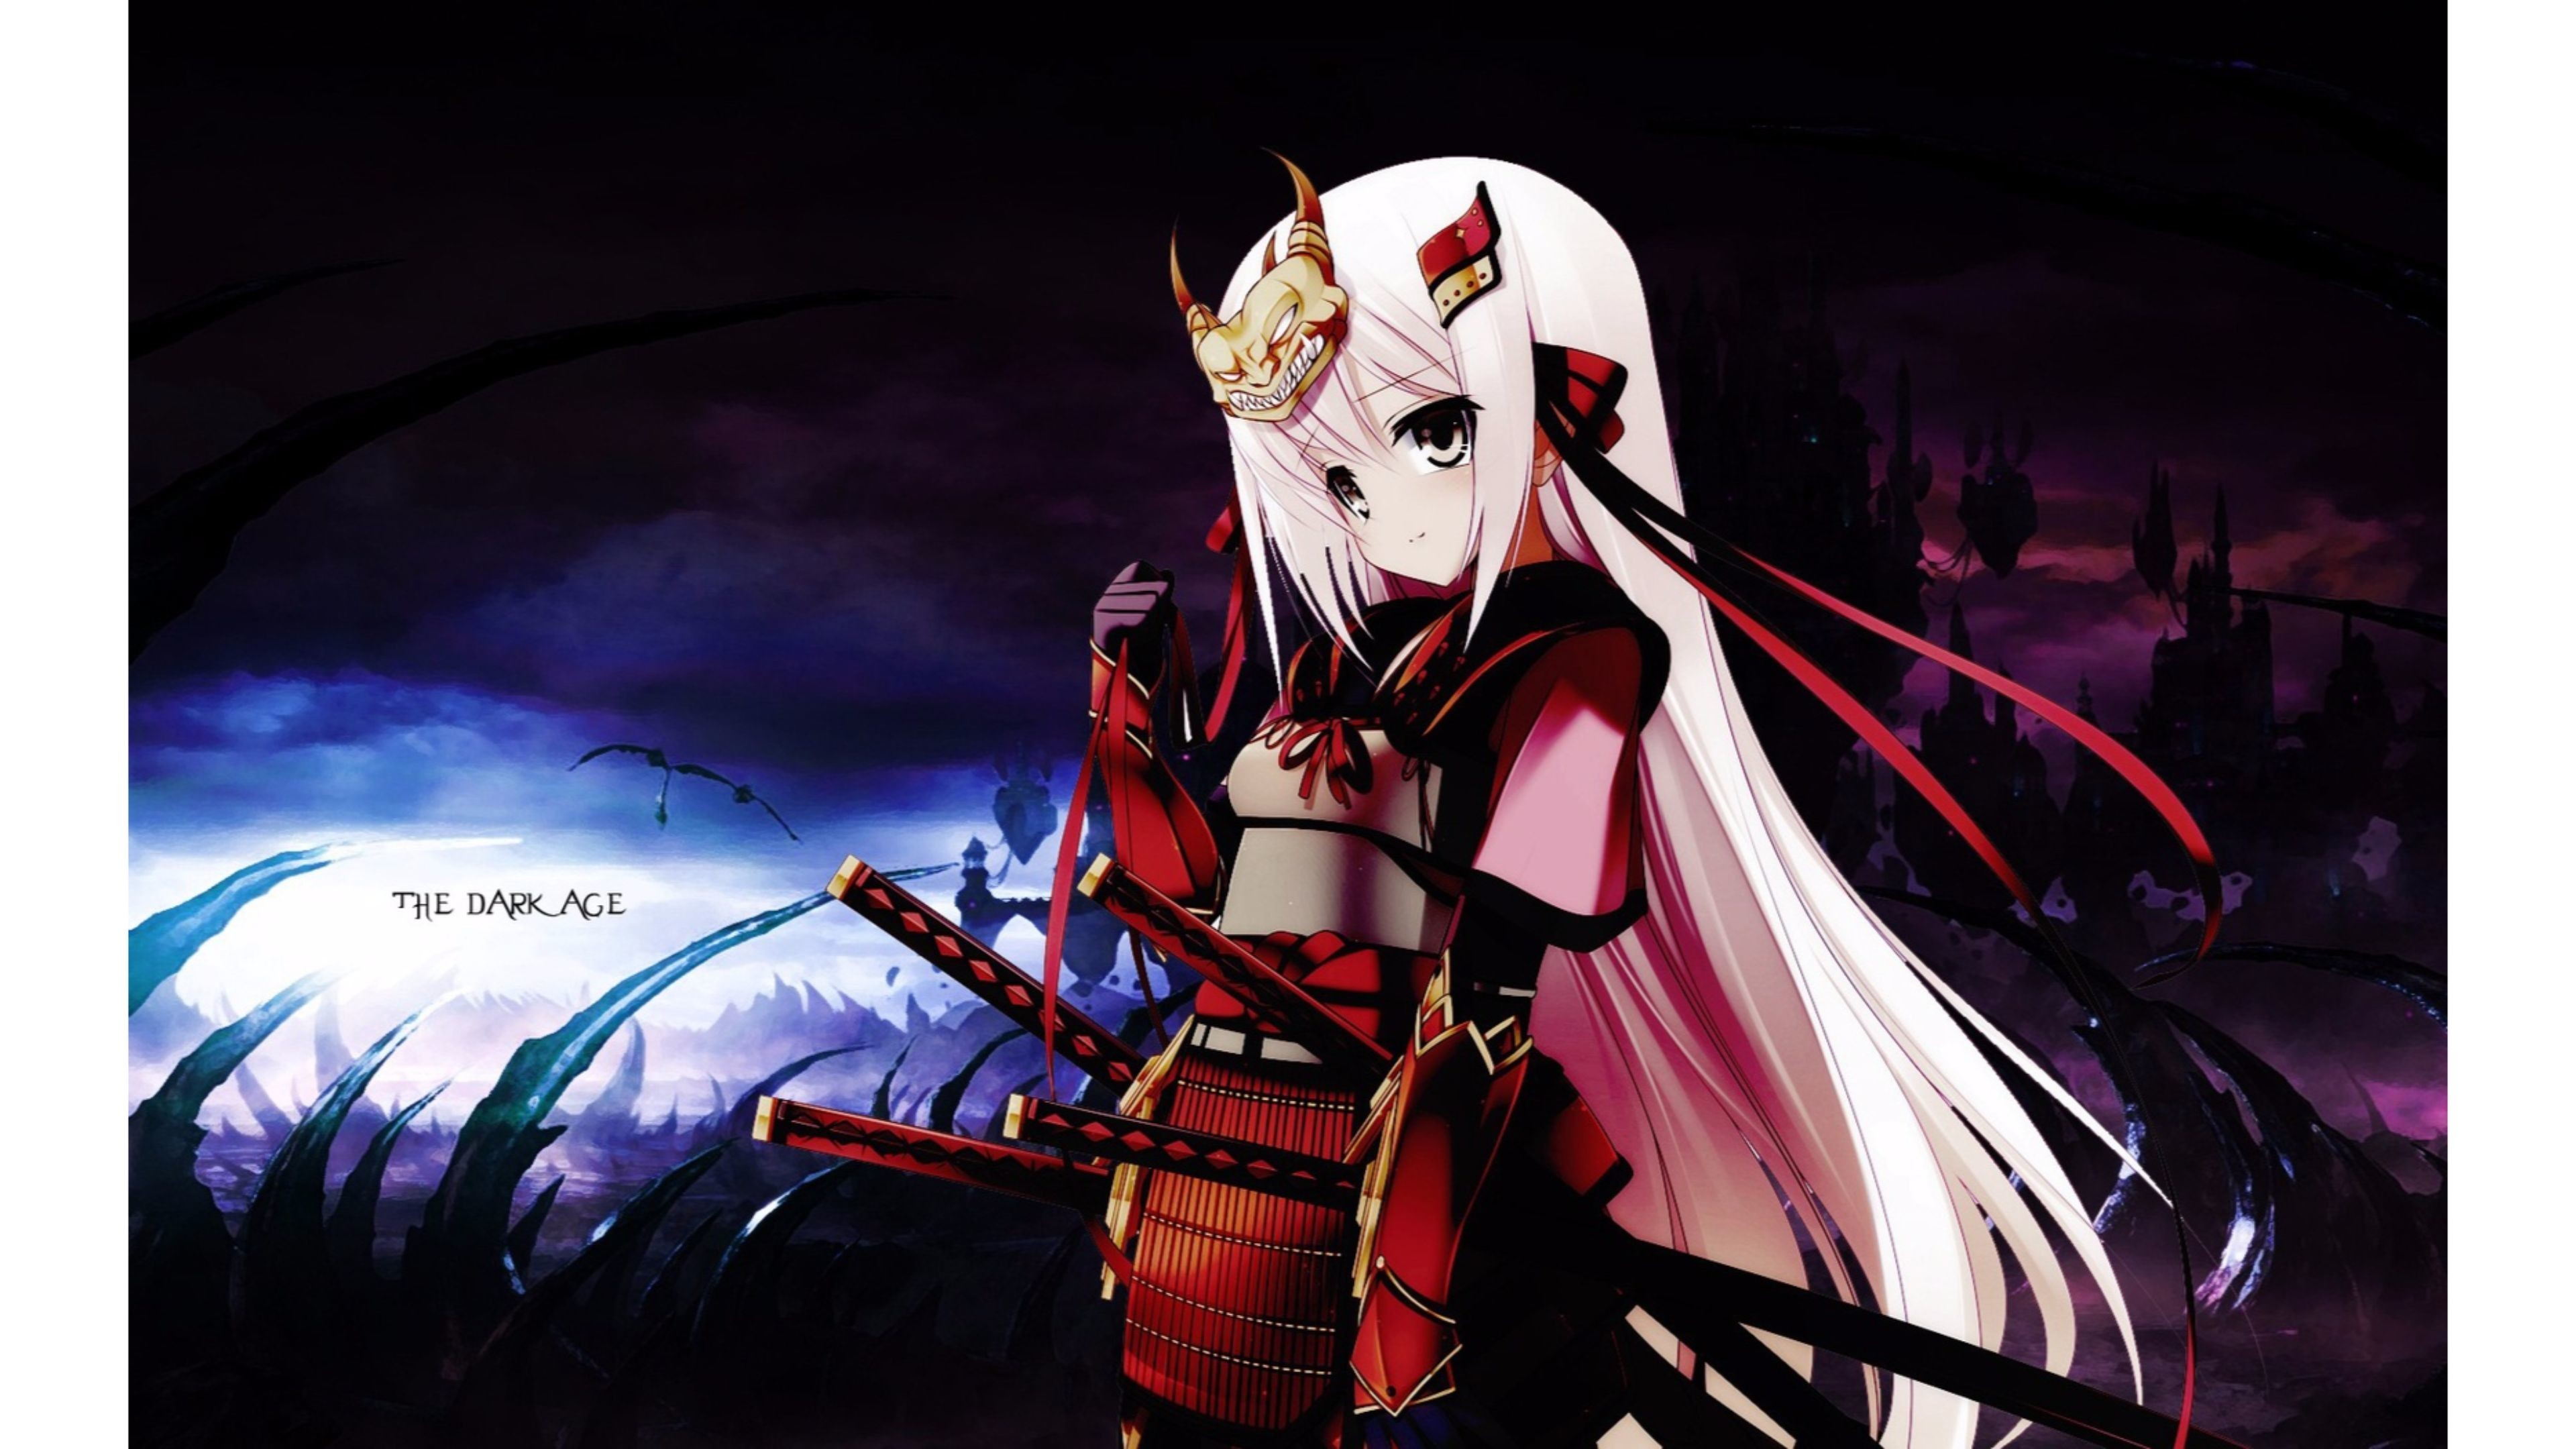 114 4k Anime